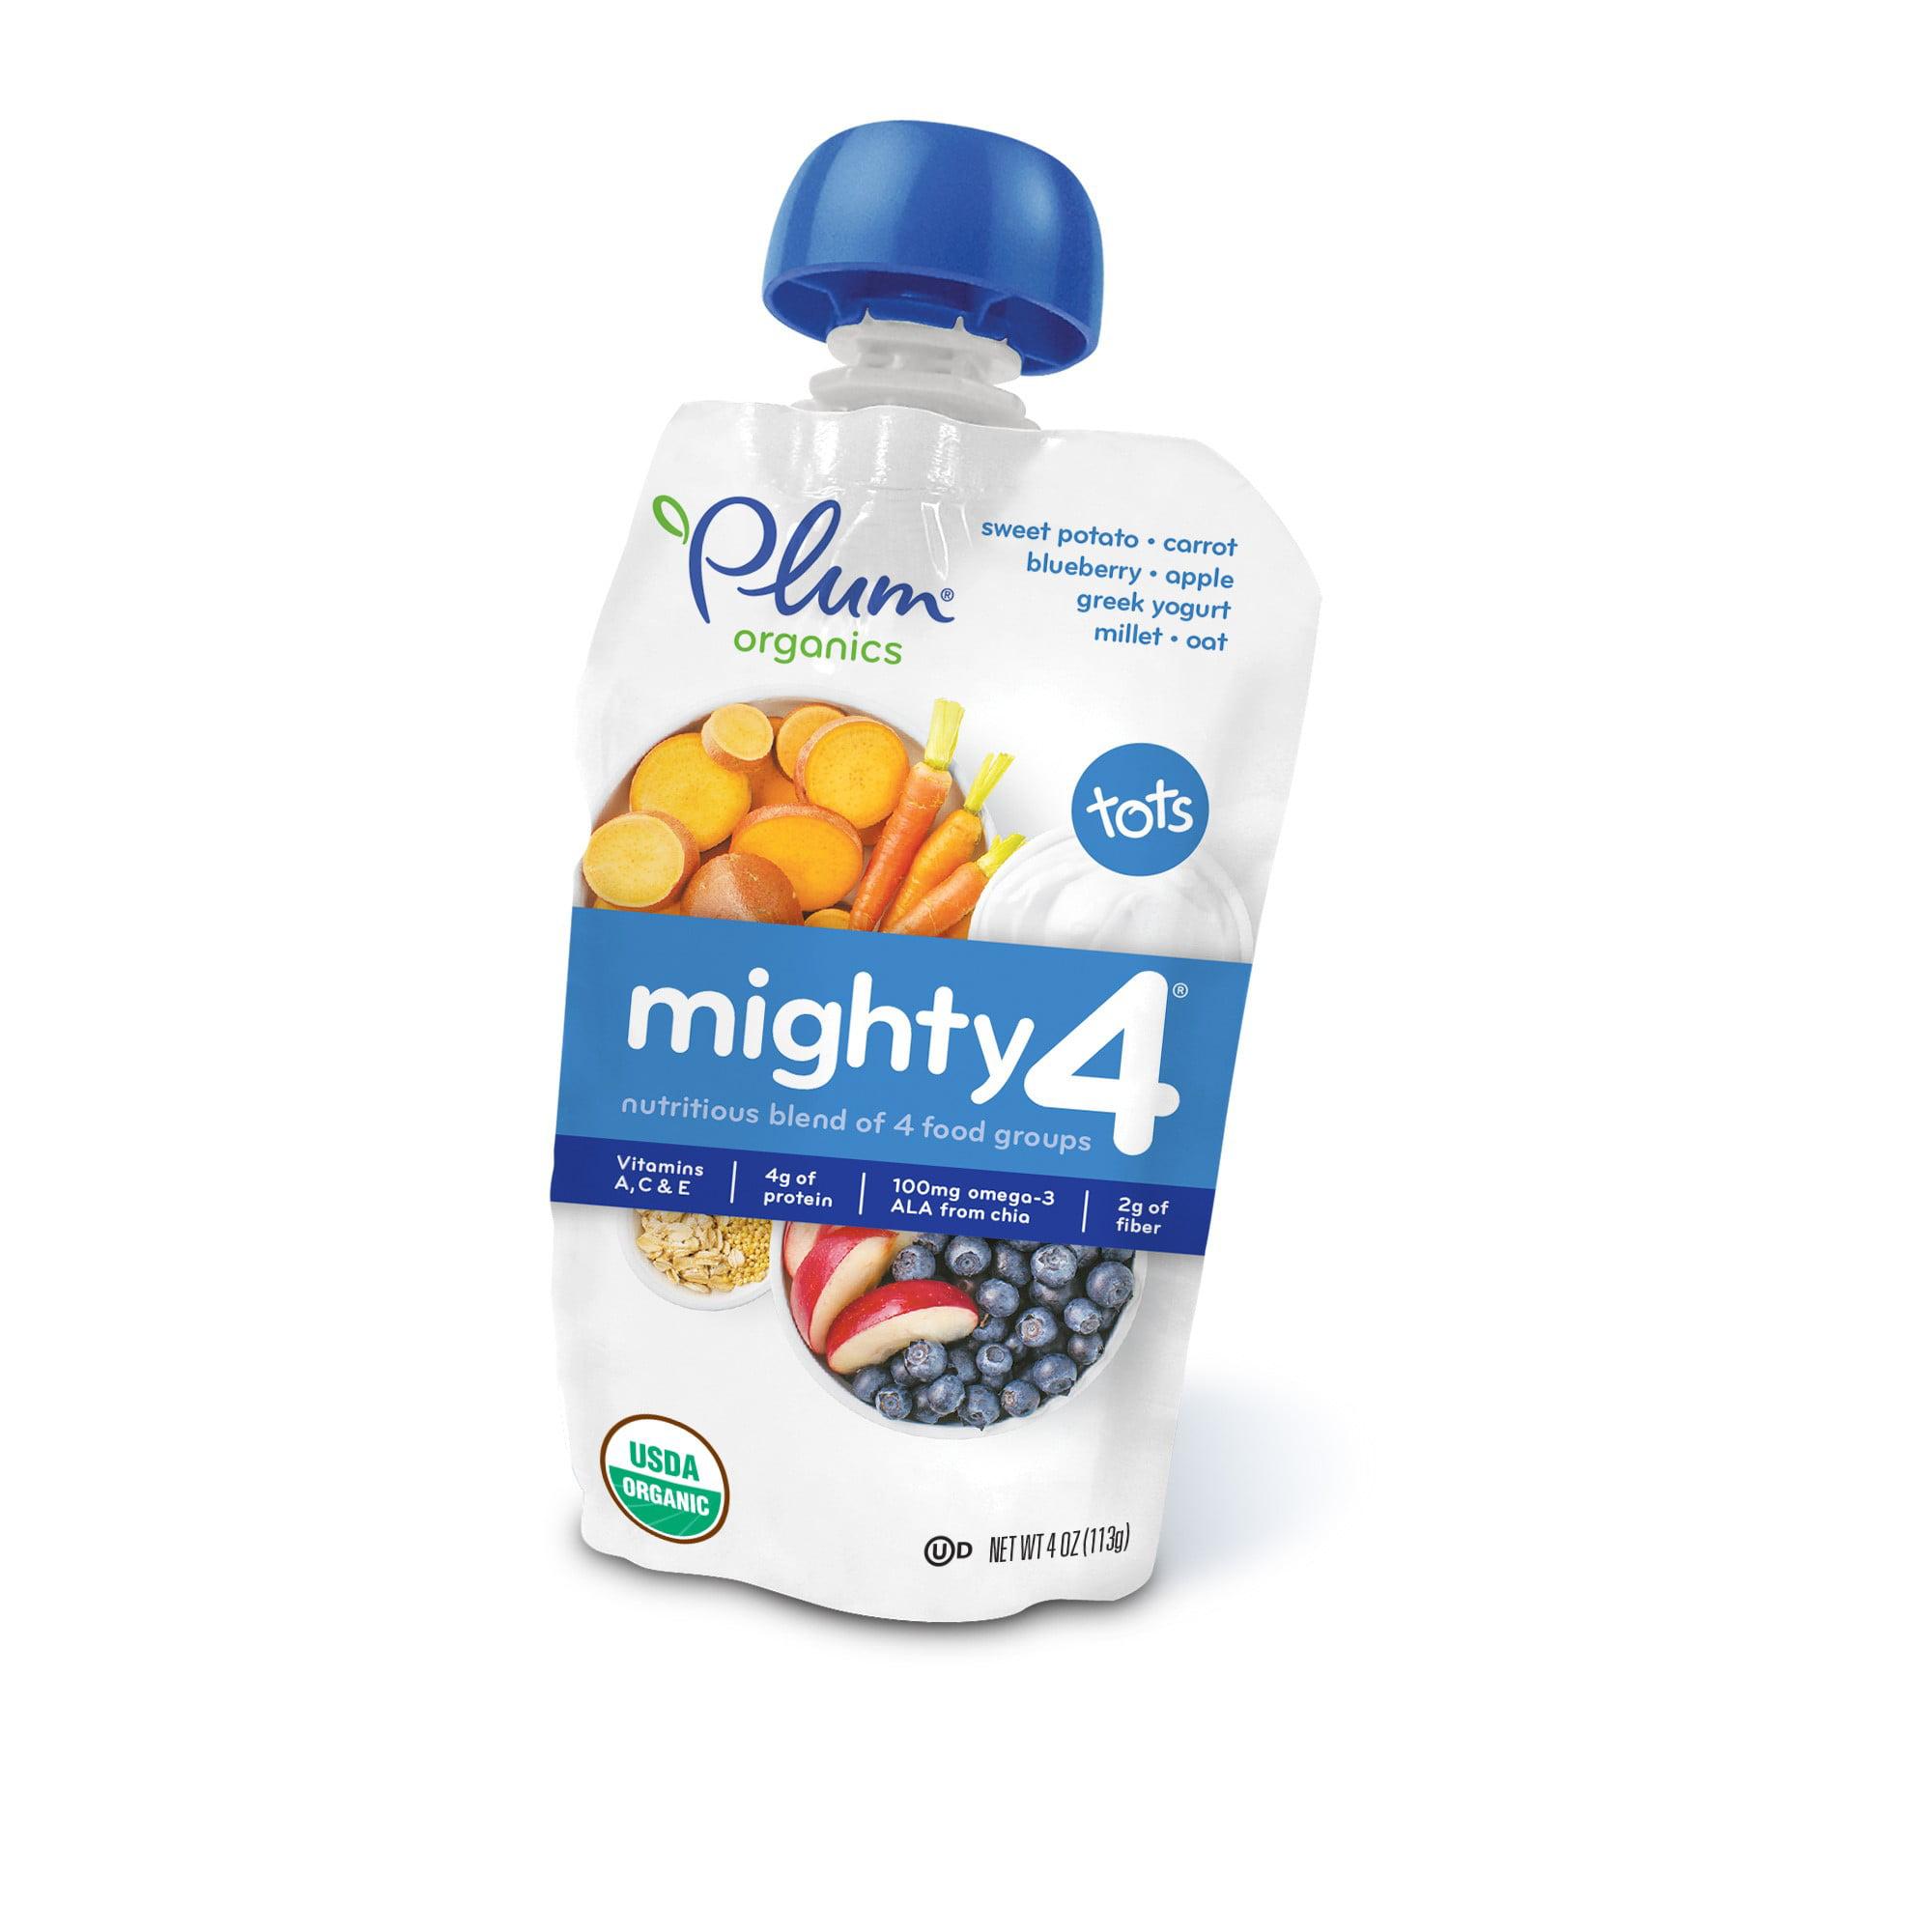 Plum Organics Tots Mighty 4 Sweet Potato, Blueberry, Millet & Greek Yogurt Essential Nutrition Blend, 4 oz, (Pack of 6)